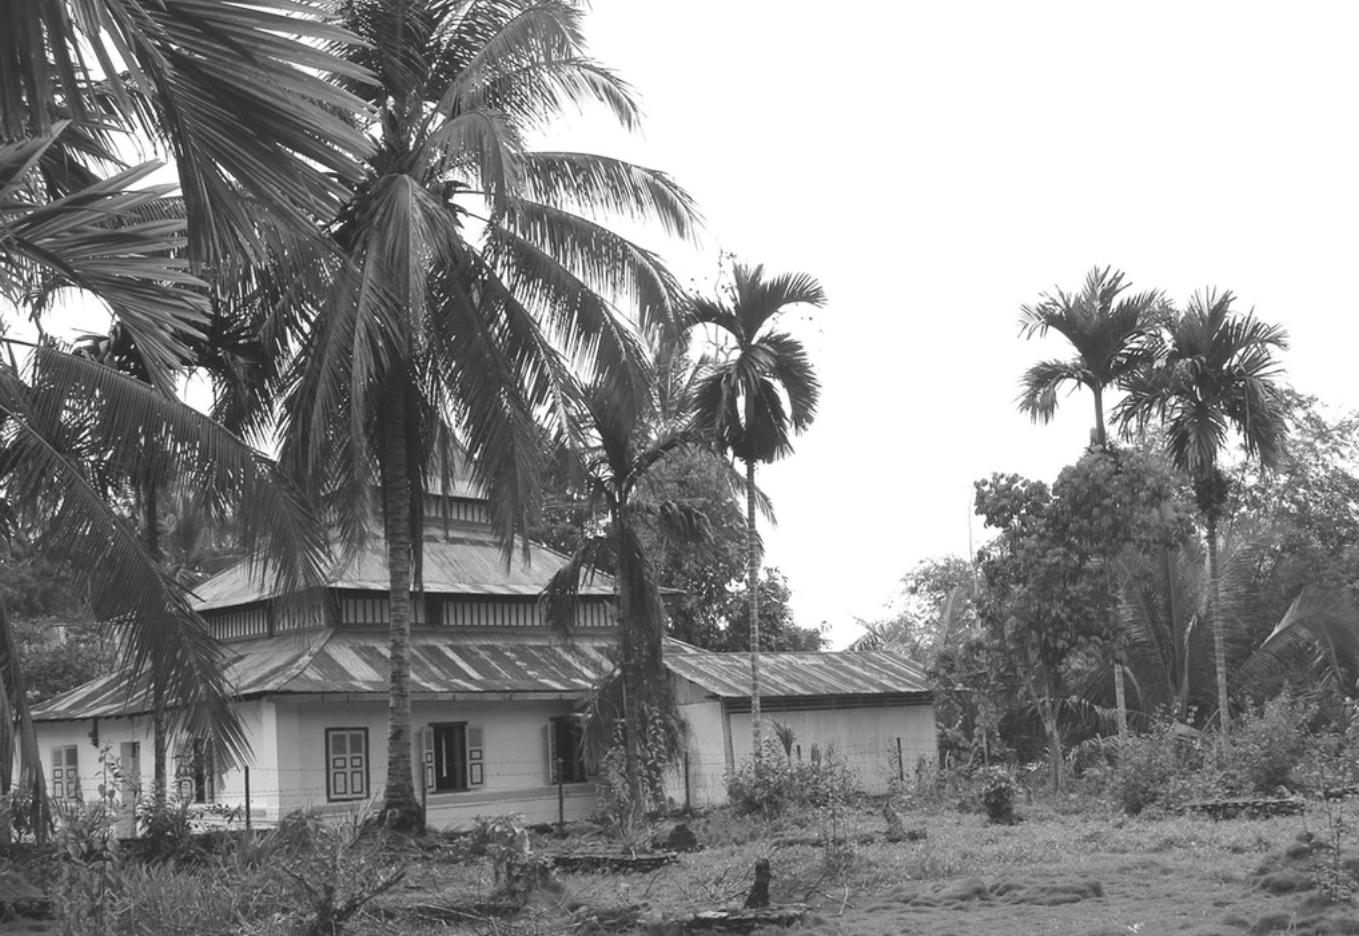 Masjid Tua Siguntur Kabupaten Dharmasraya Sumatera Barat Penuaan